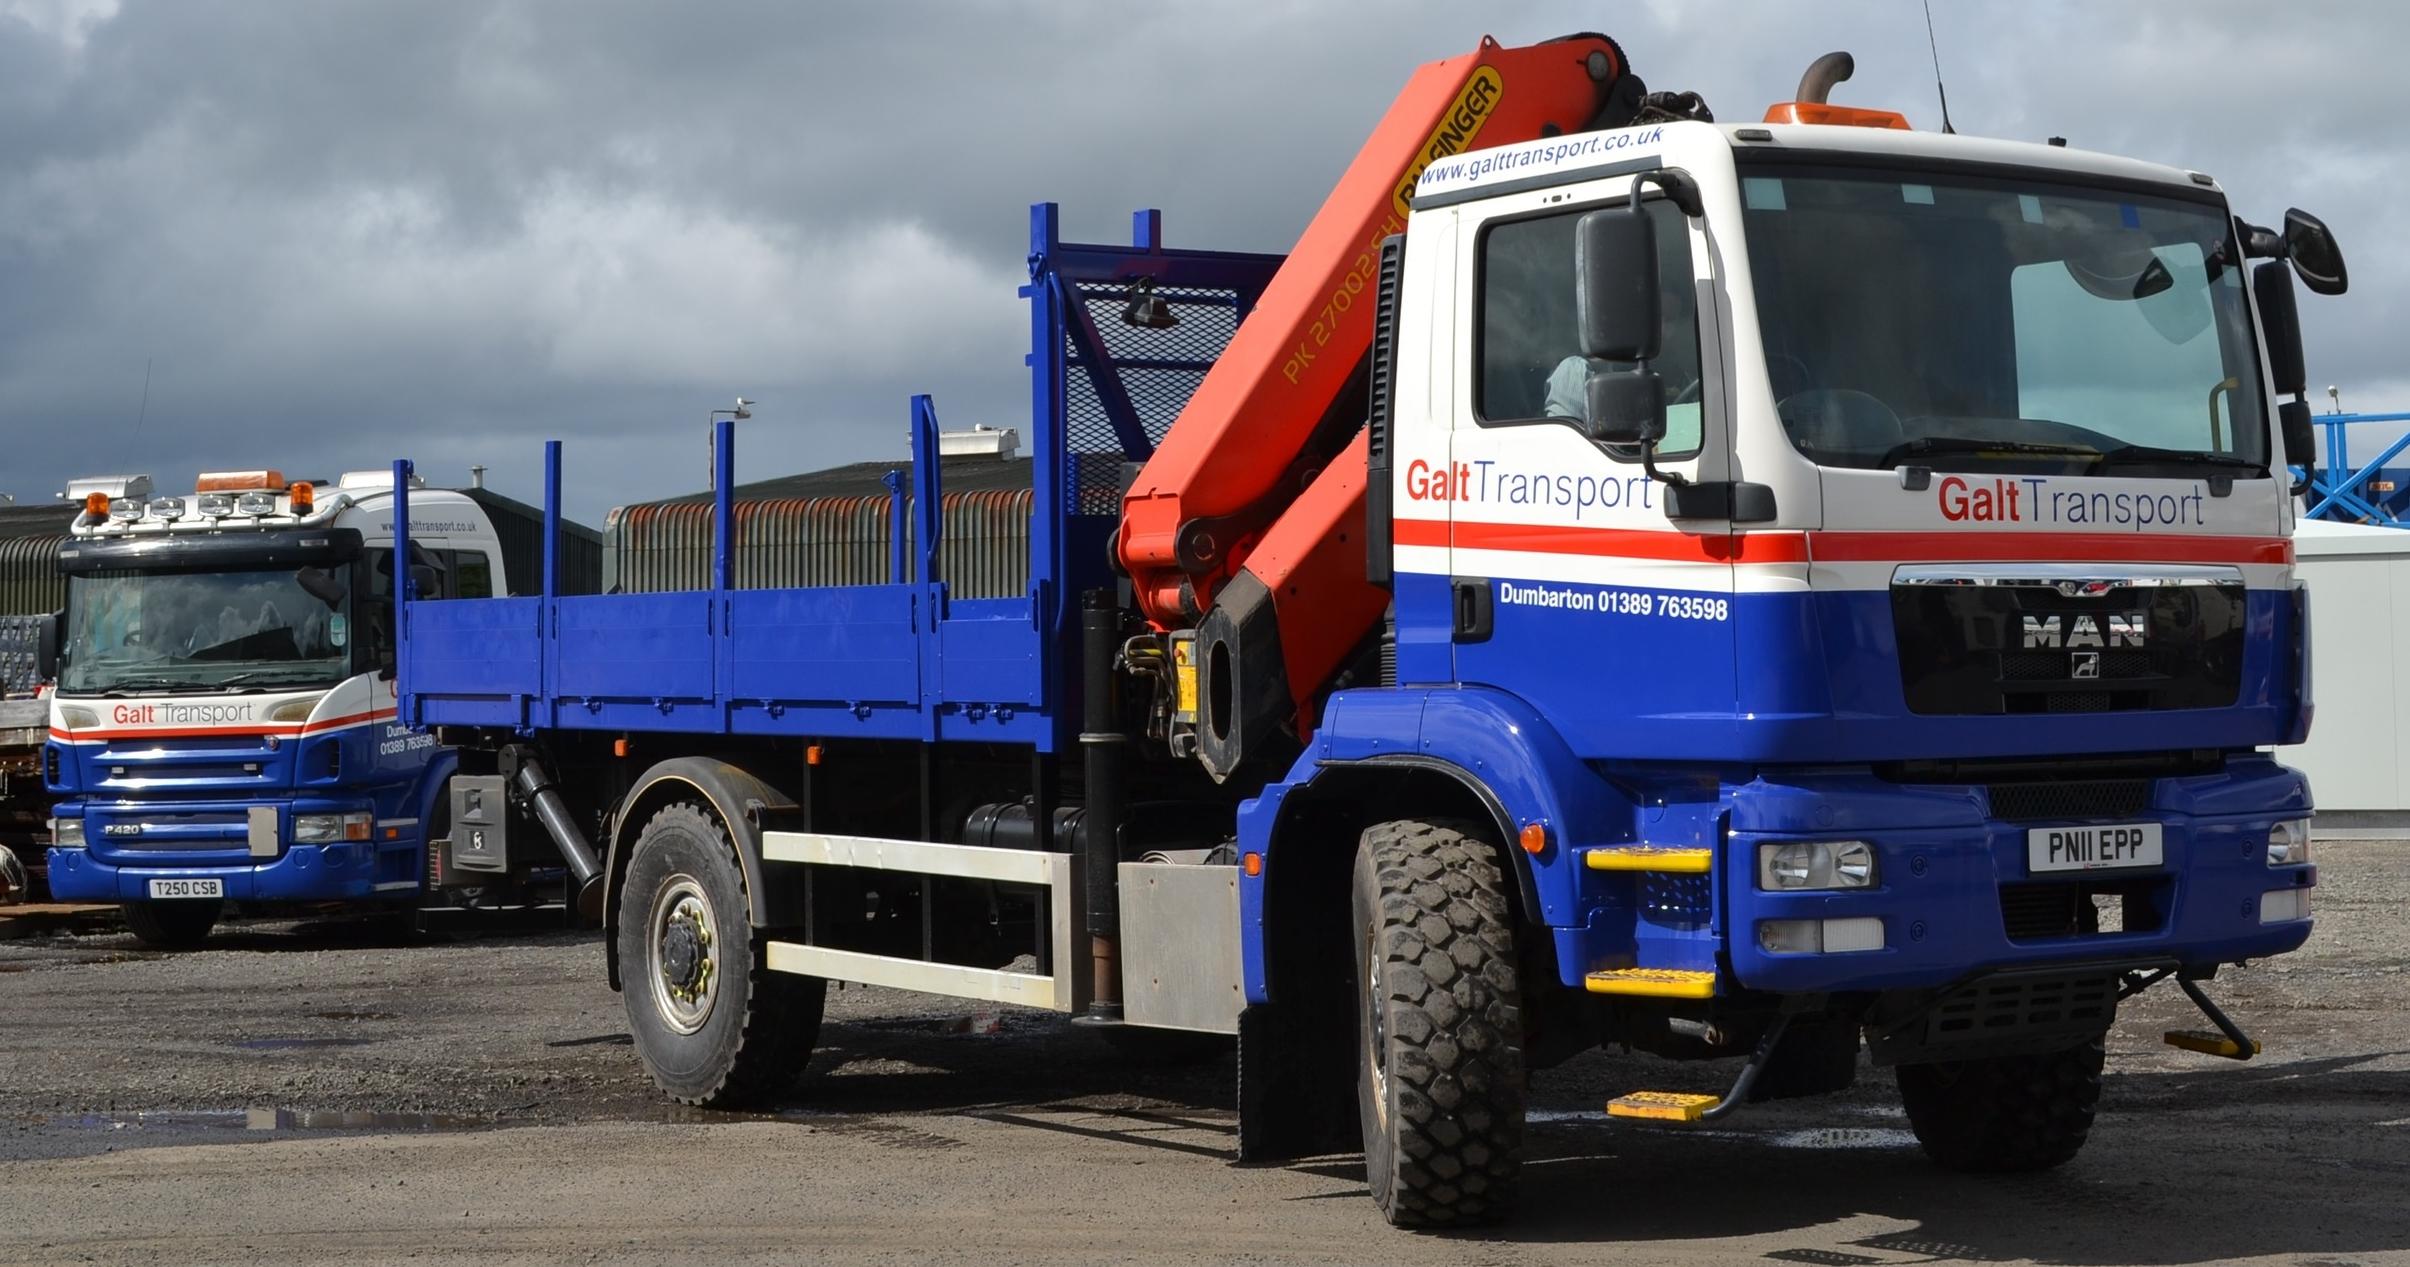 Galt Transport's new off-road vehicle